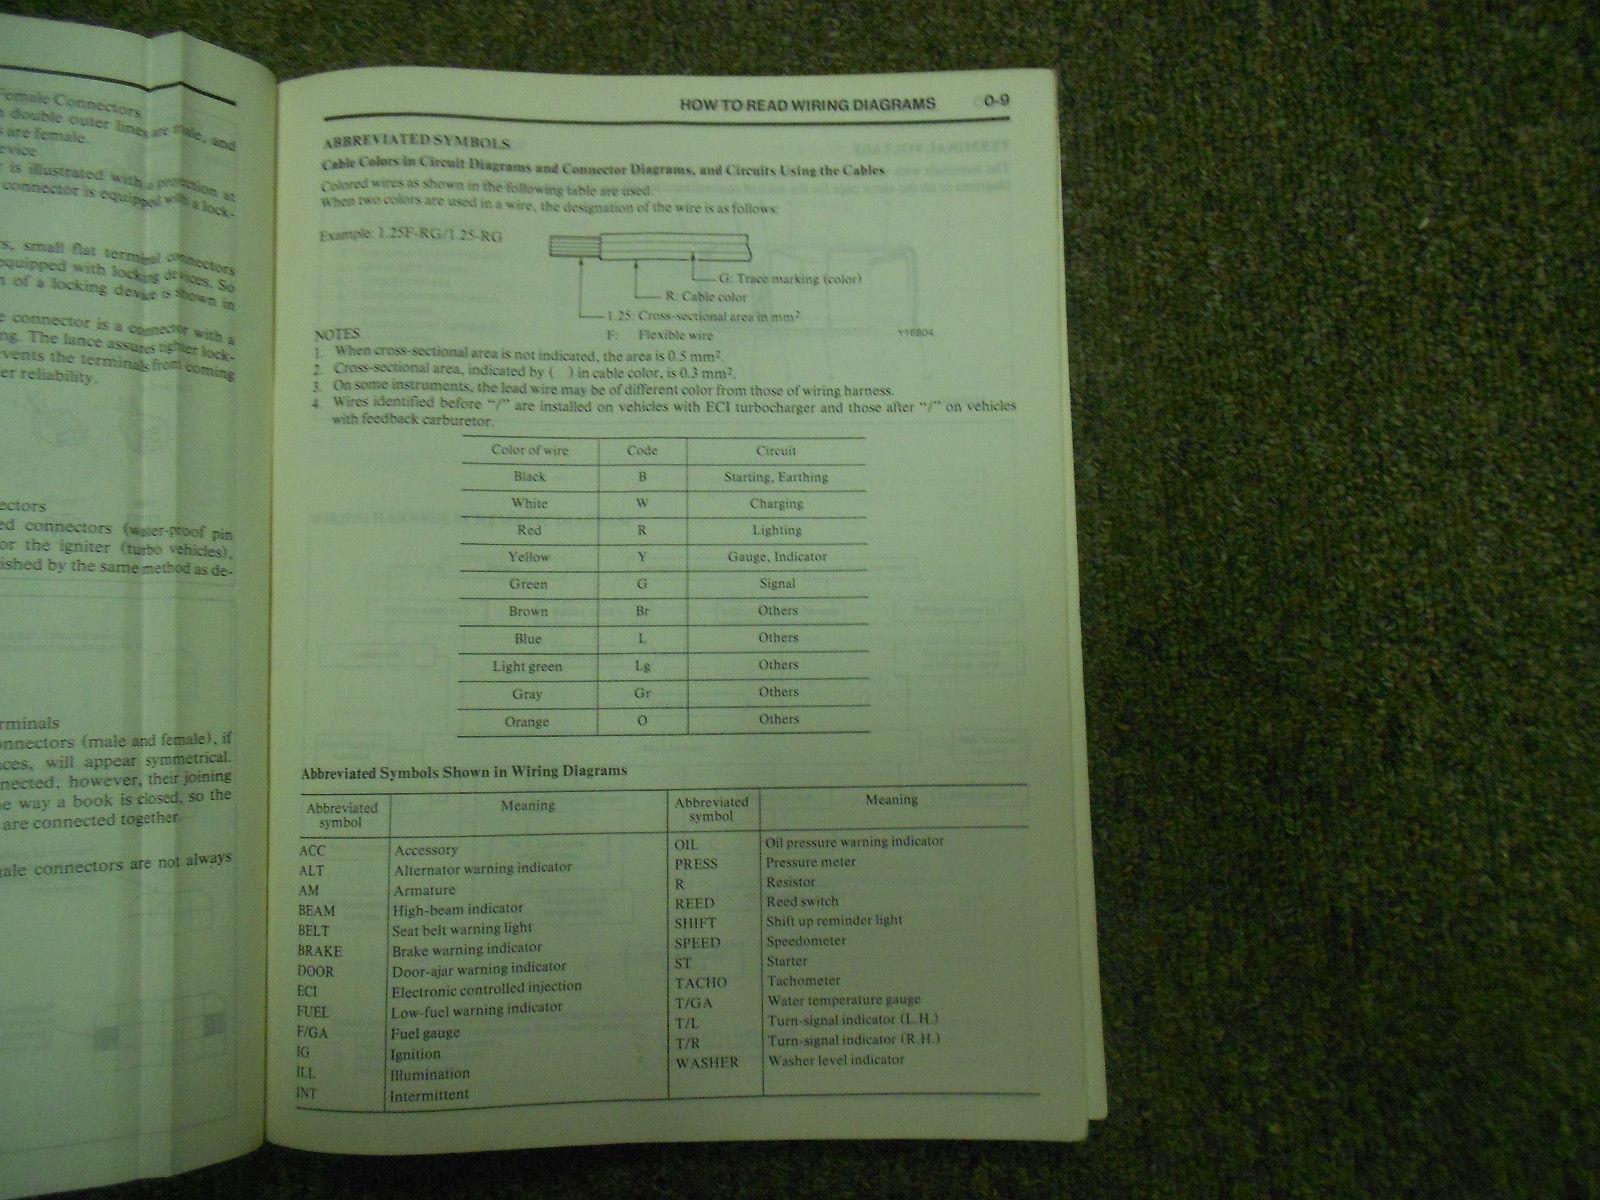 1986 Mitsubishi Mirage Electrical Wiring And 18 Similar Items Diagram Service Repair Shop Manual Factory Oem